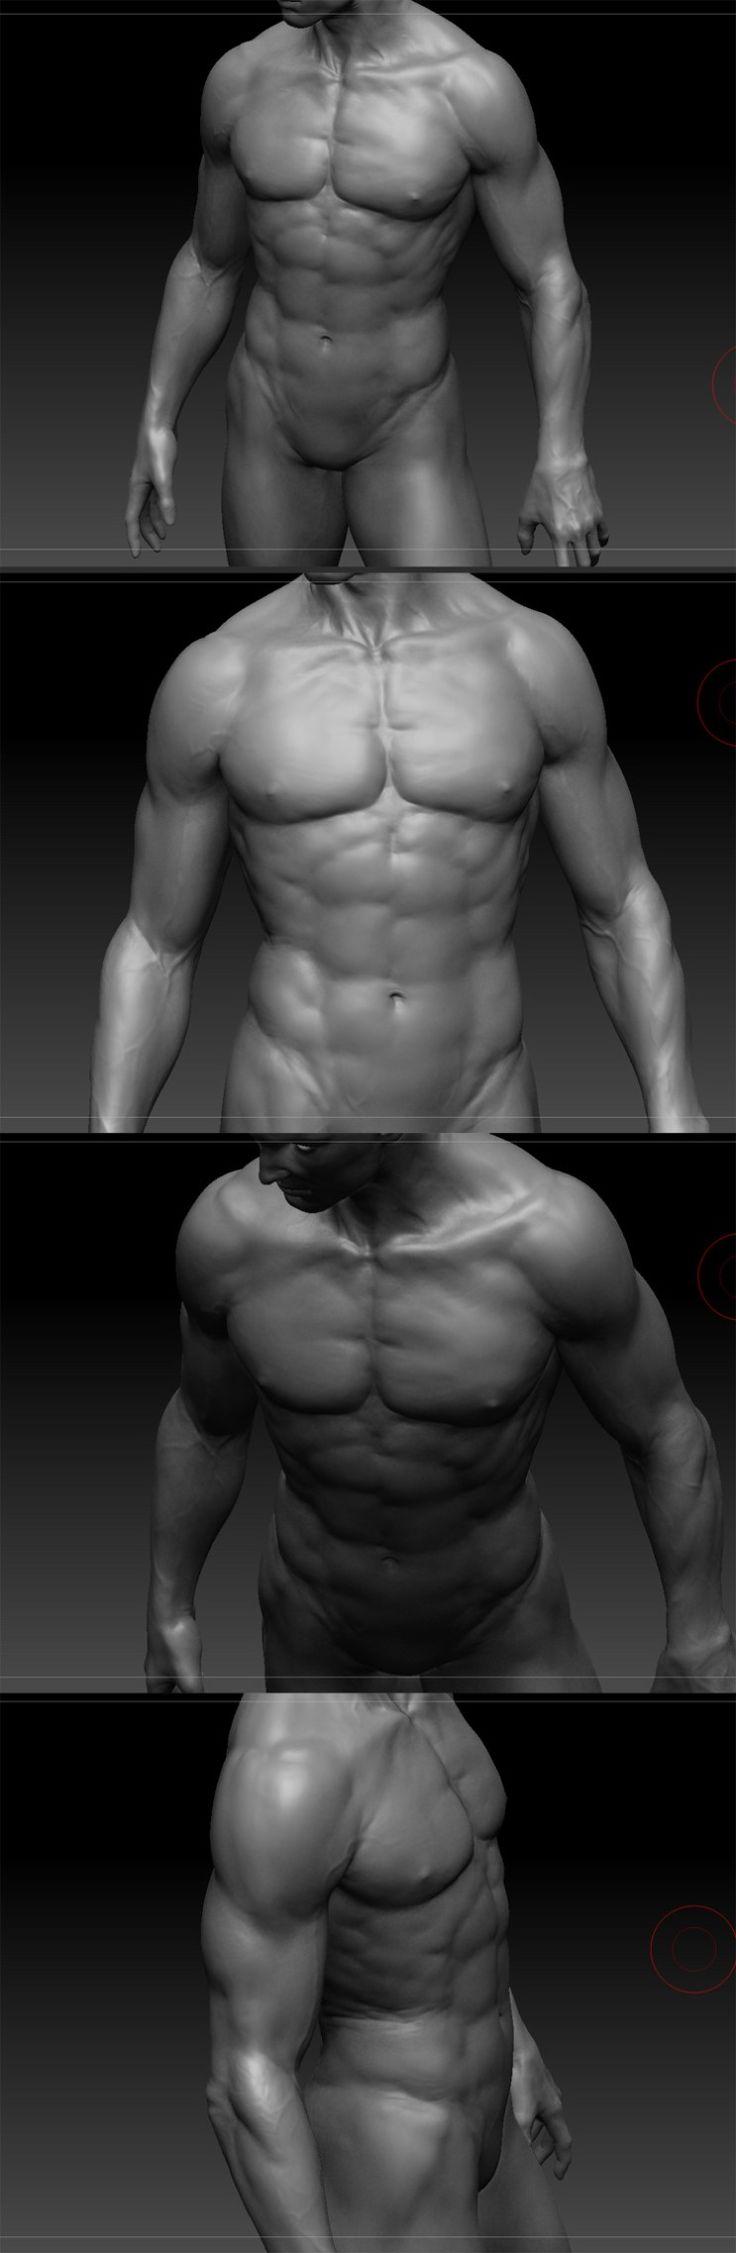 Human anatomy study_vray [출처] Human anatomy study_vray|작성자 장성환